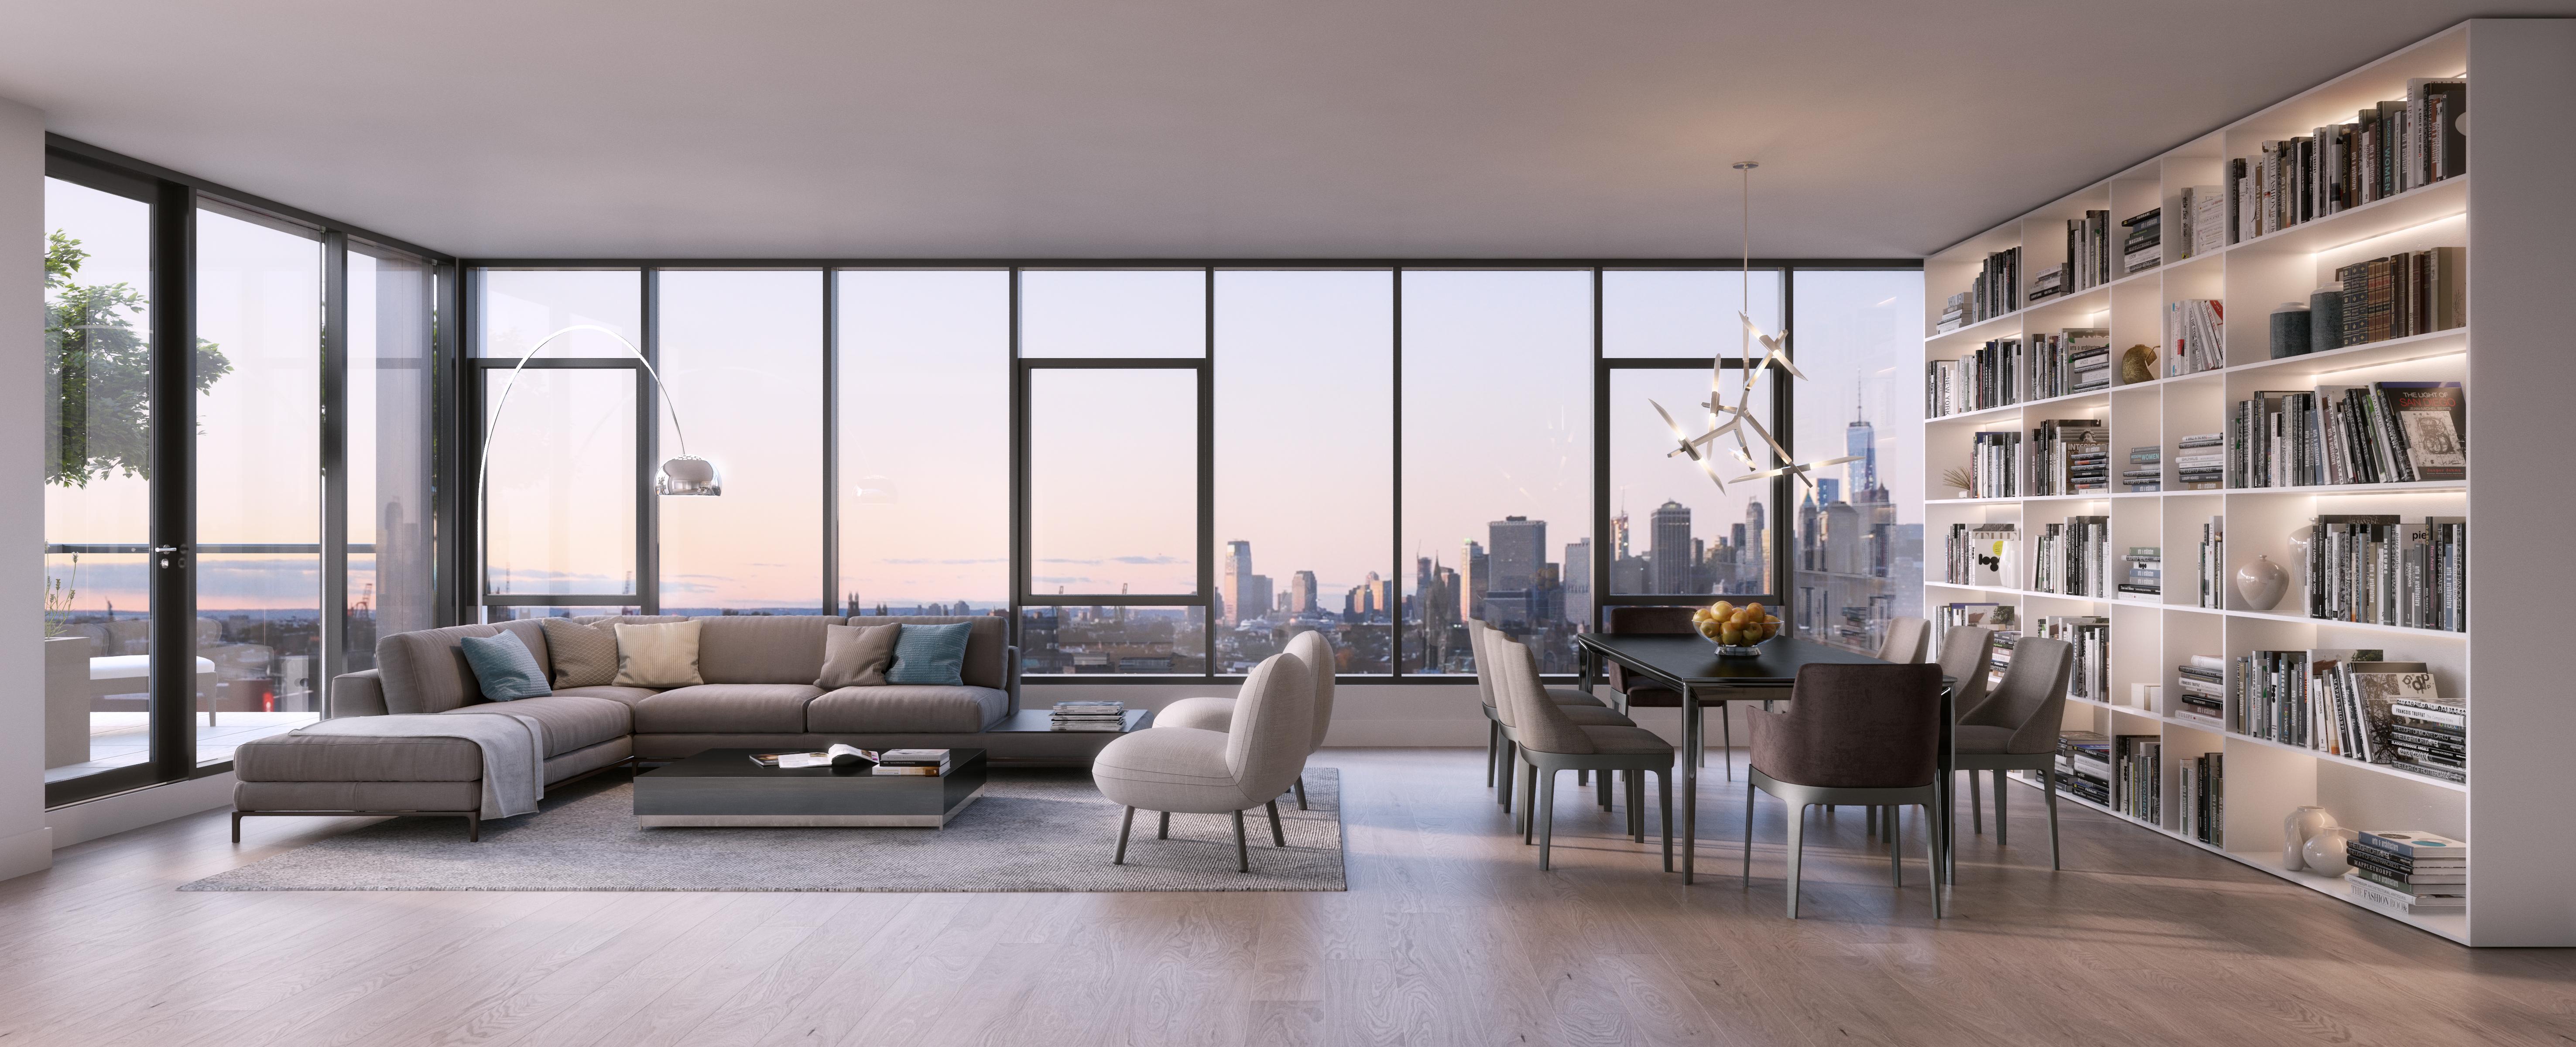 251 1st street Penthouse